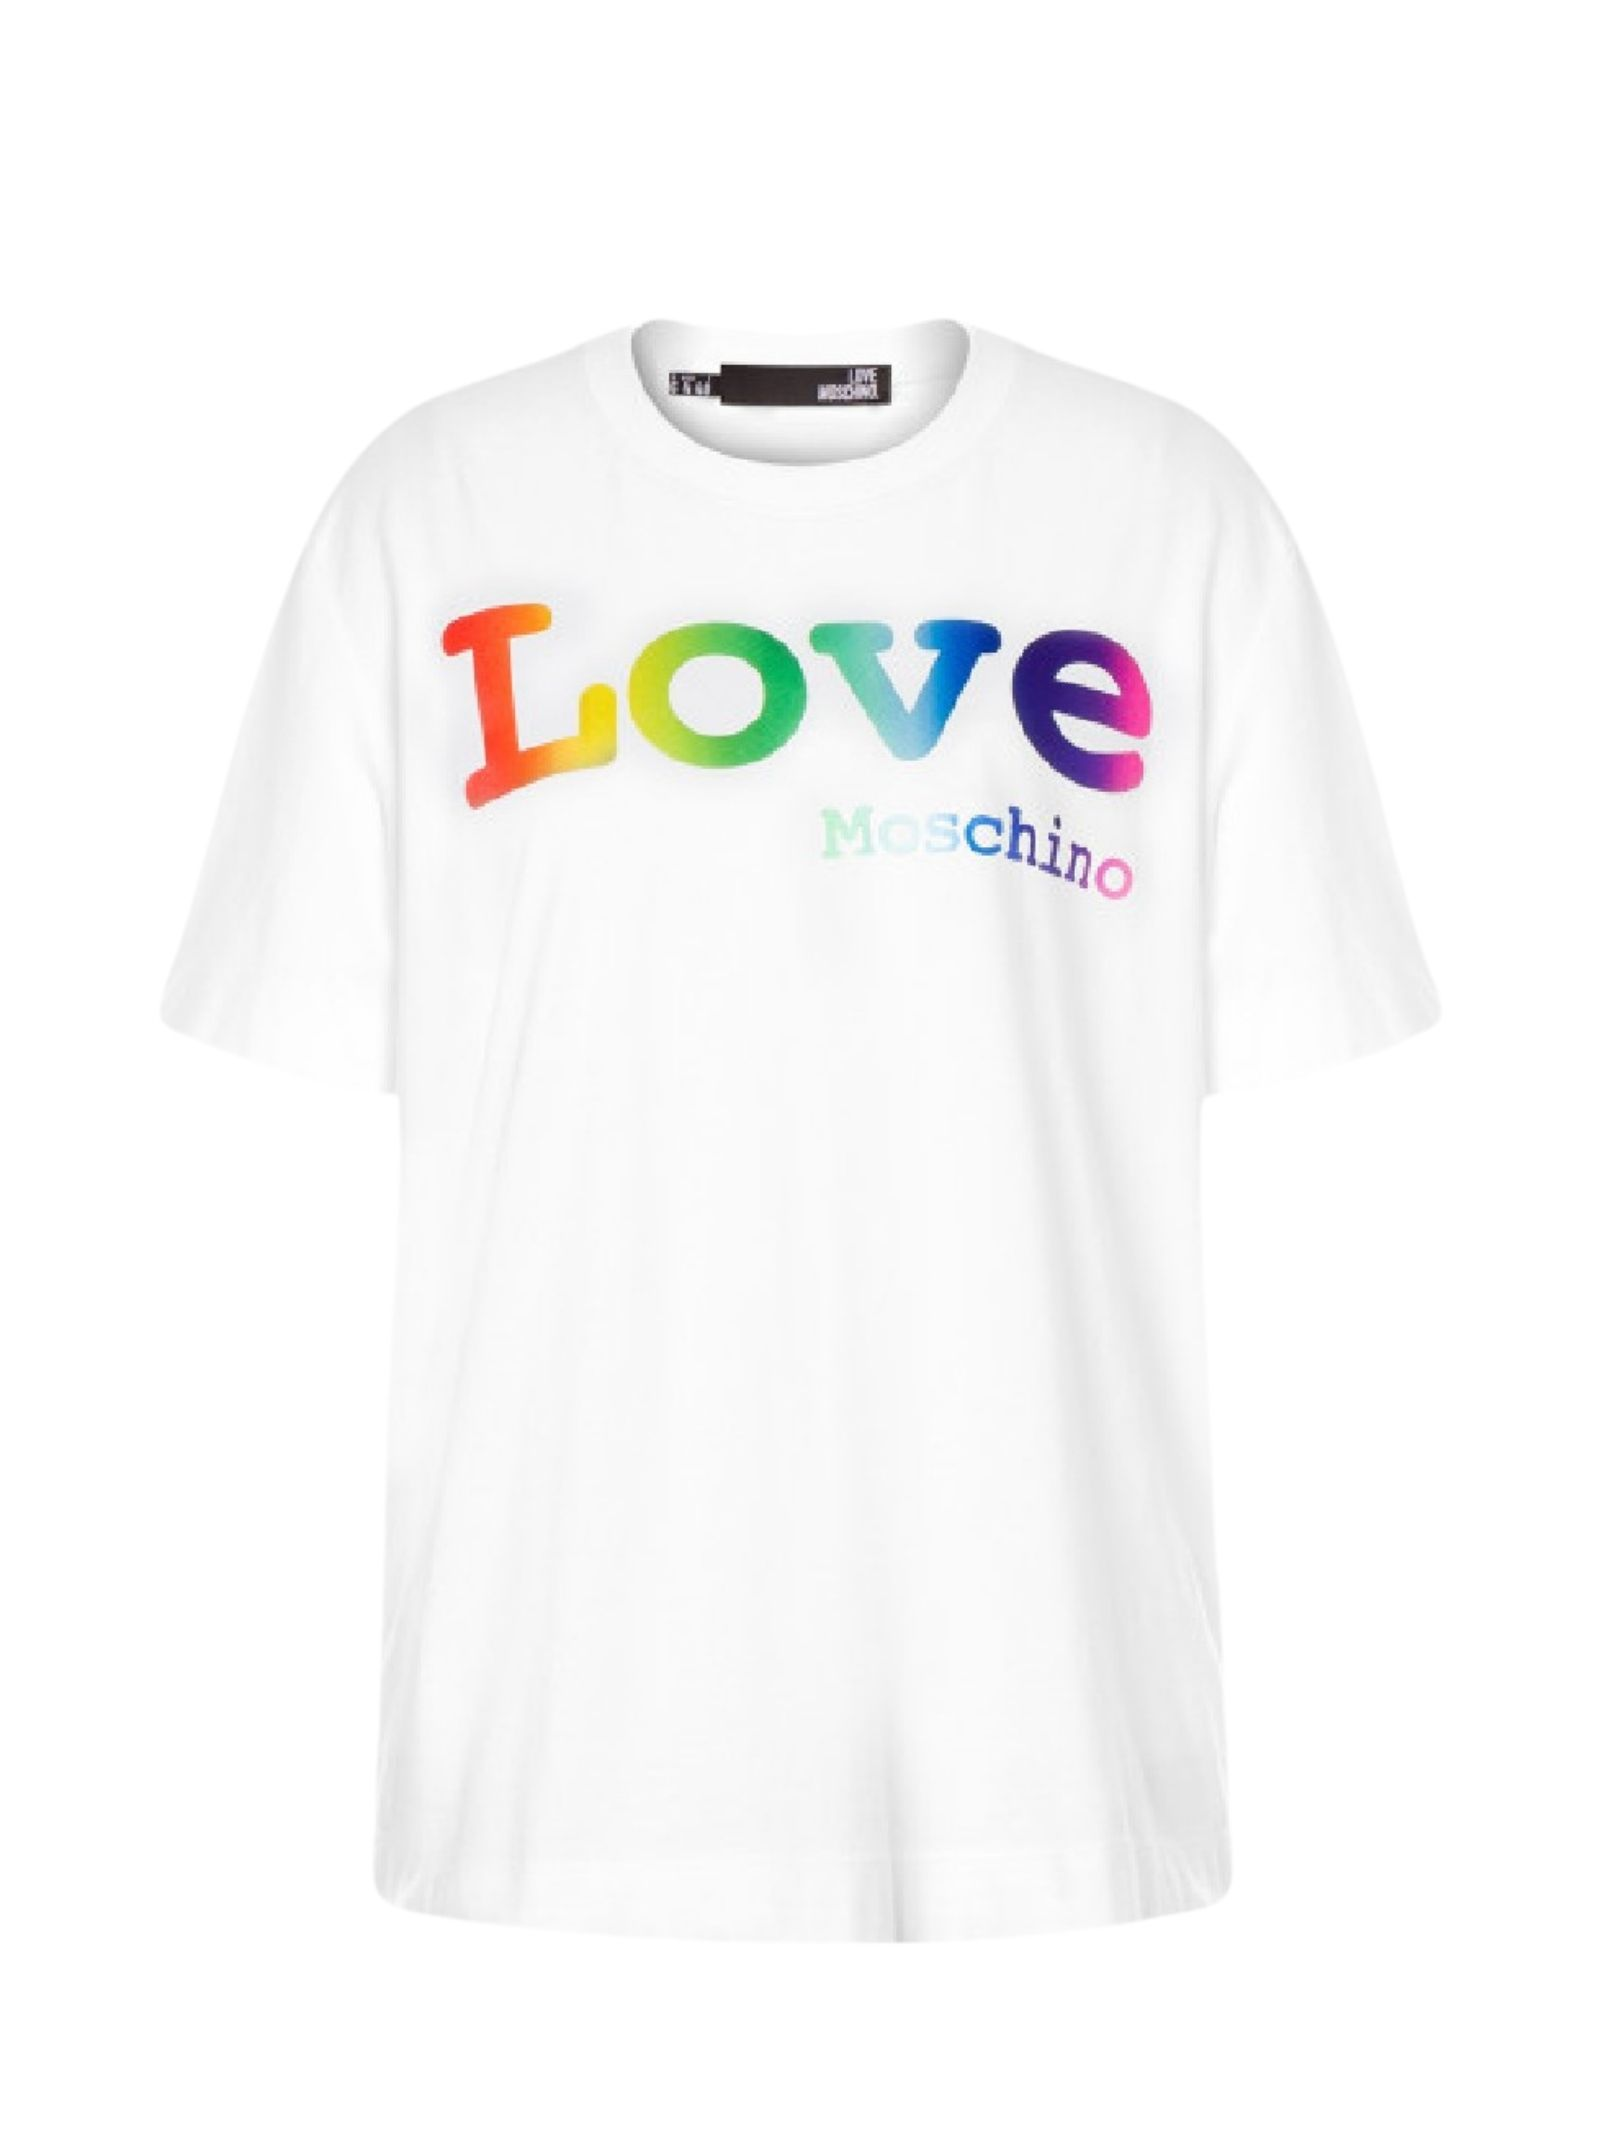 MOSCHINO LOVE   T-shirt   W 4 H06 06 M 3876A00